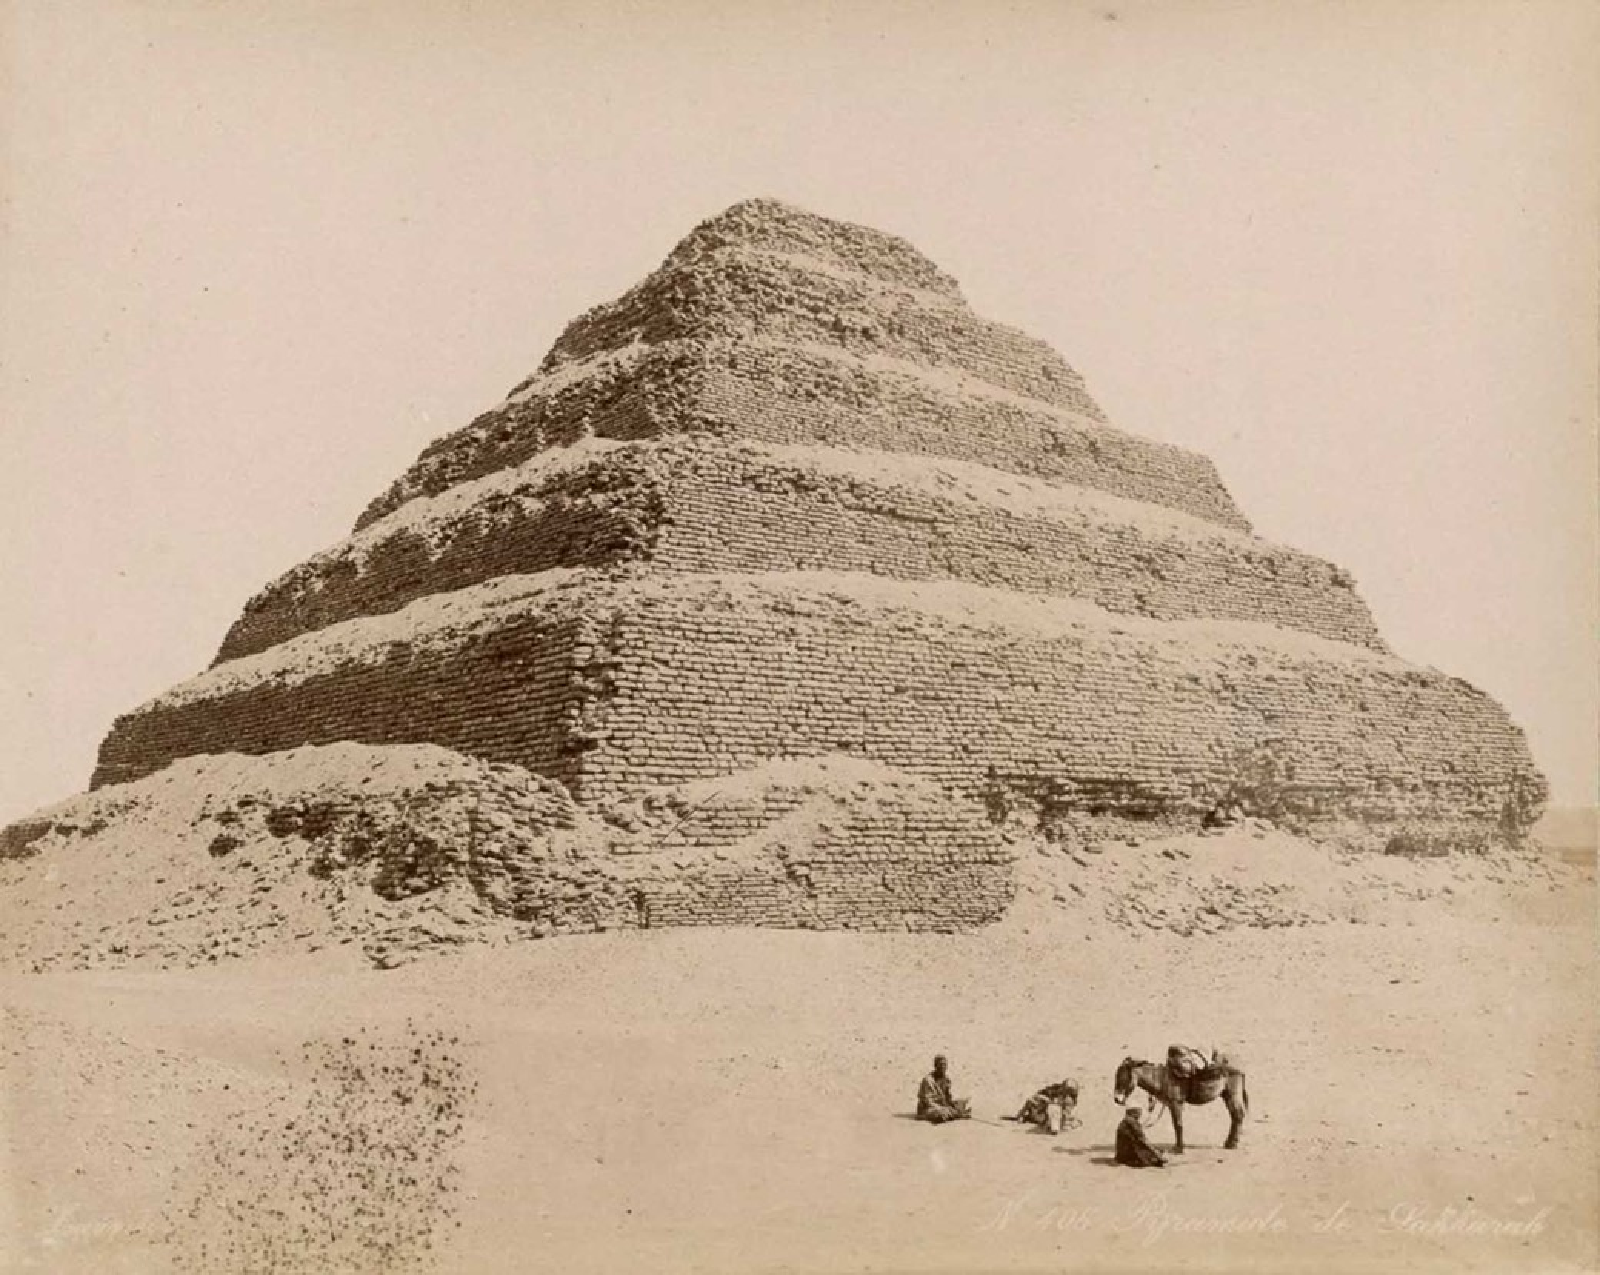 Pirâmide de Djoser em Saqqara